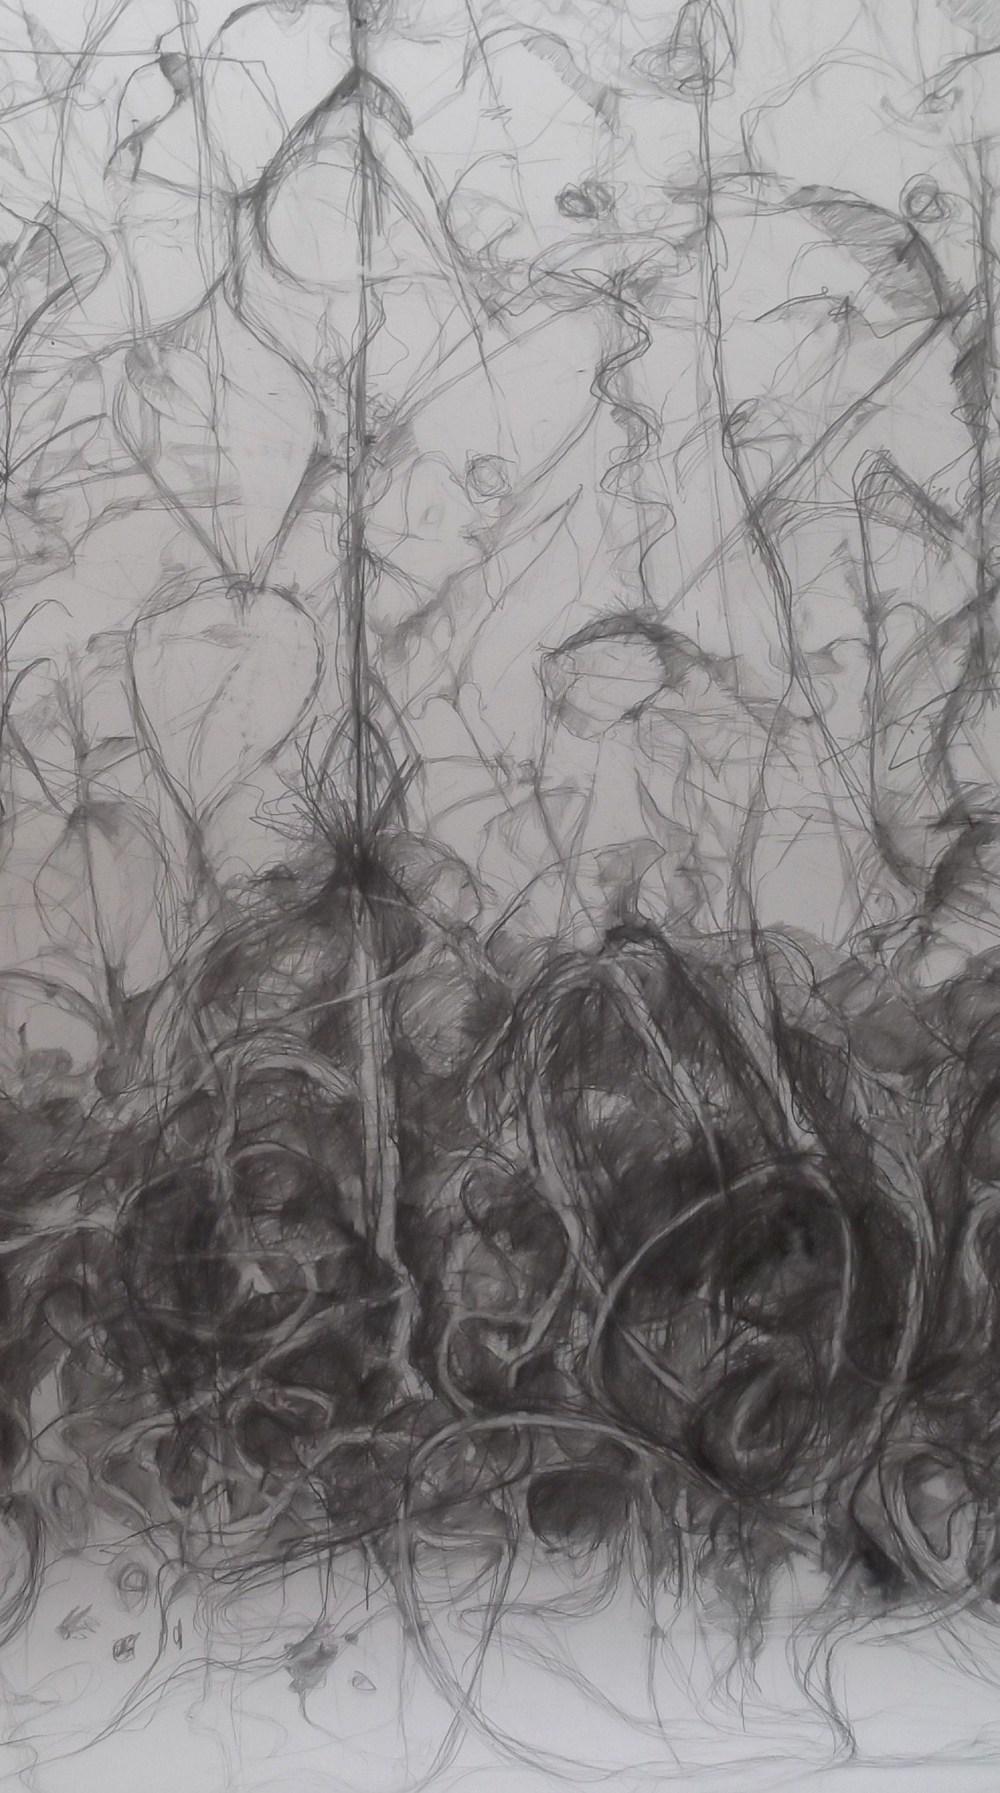 Summer Drawing detail 002.JPG